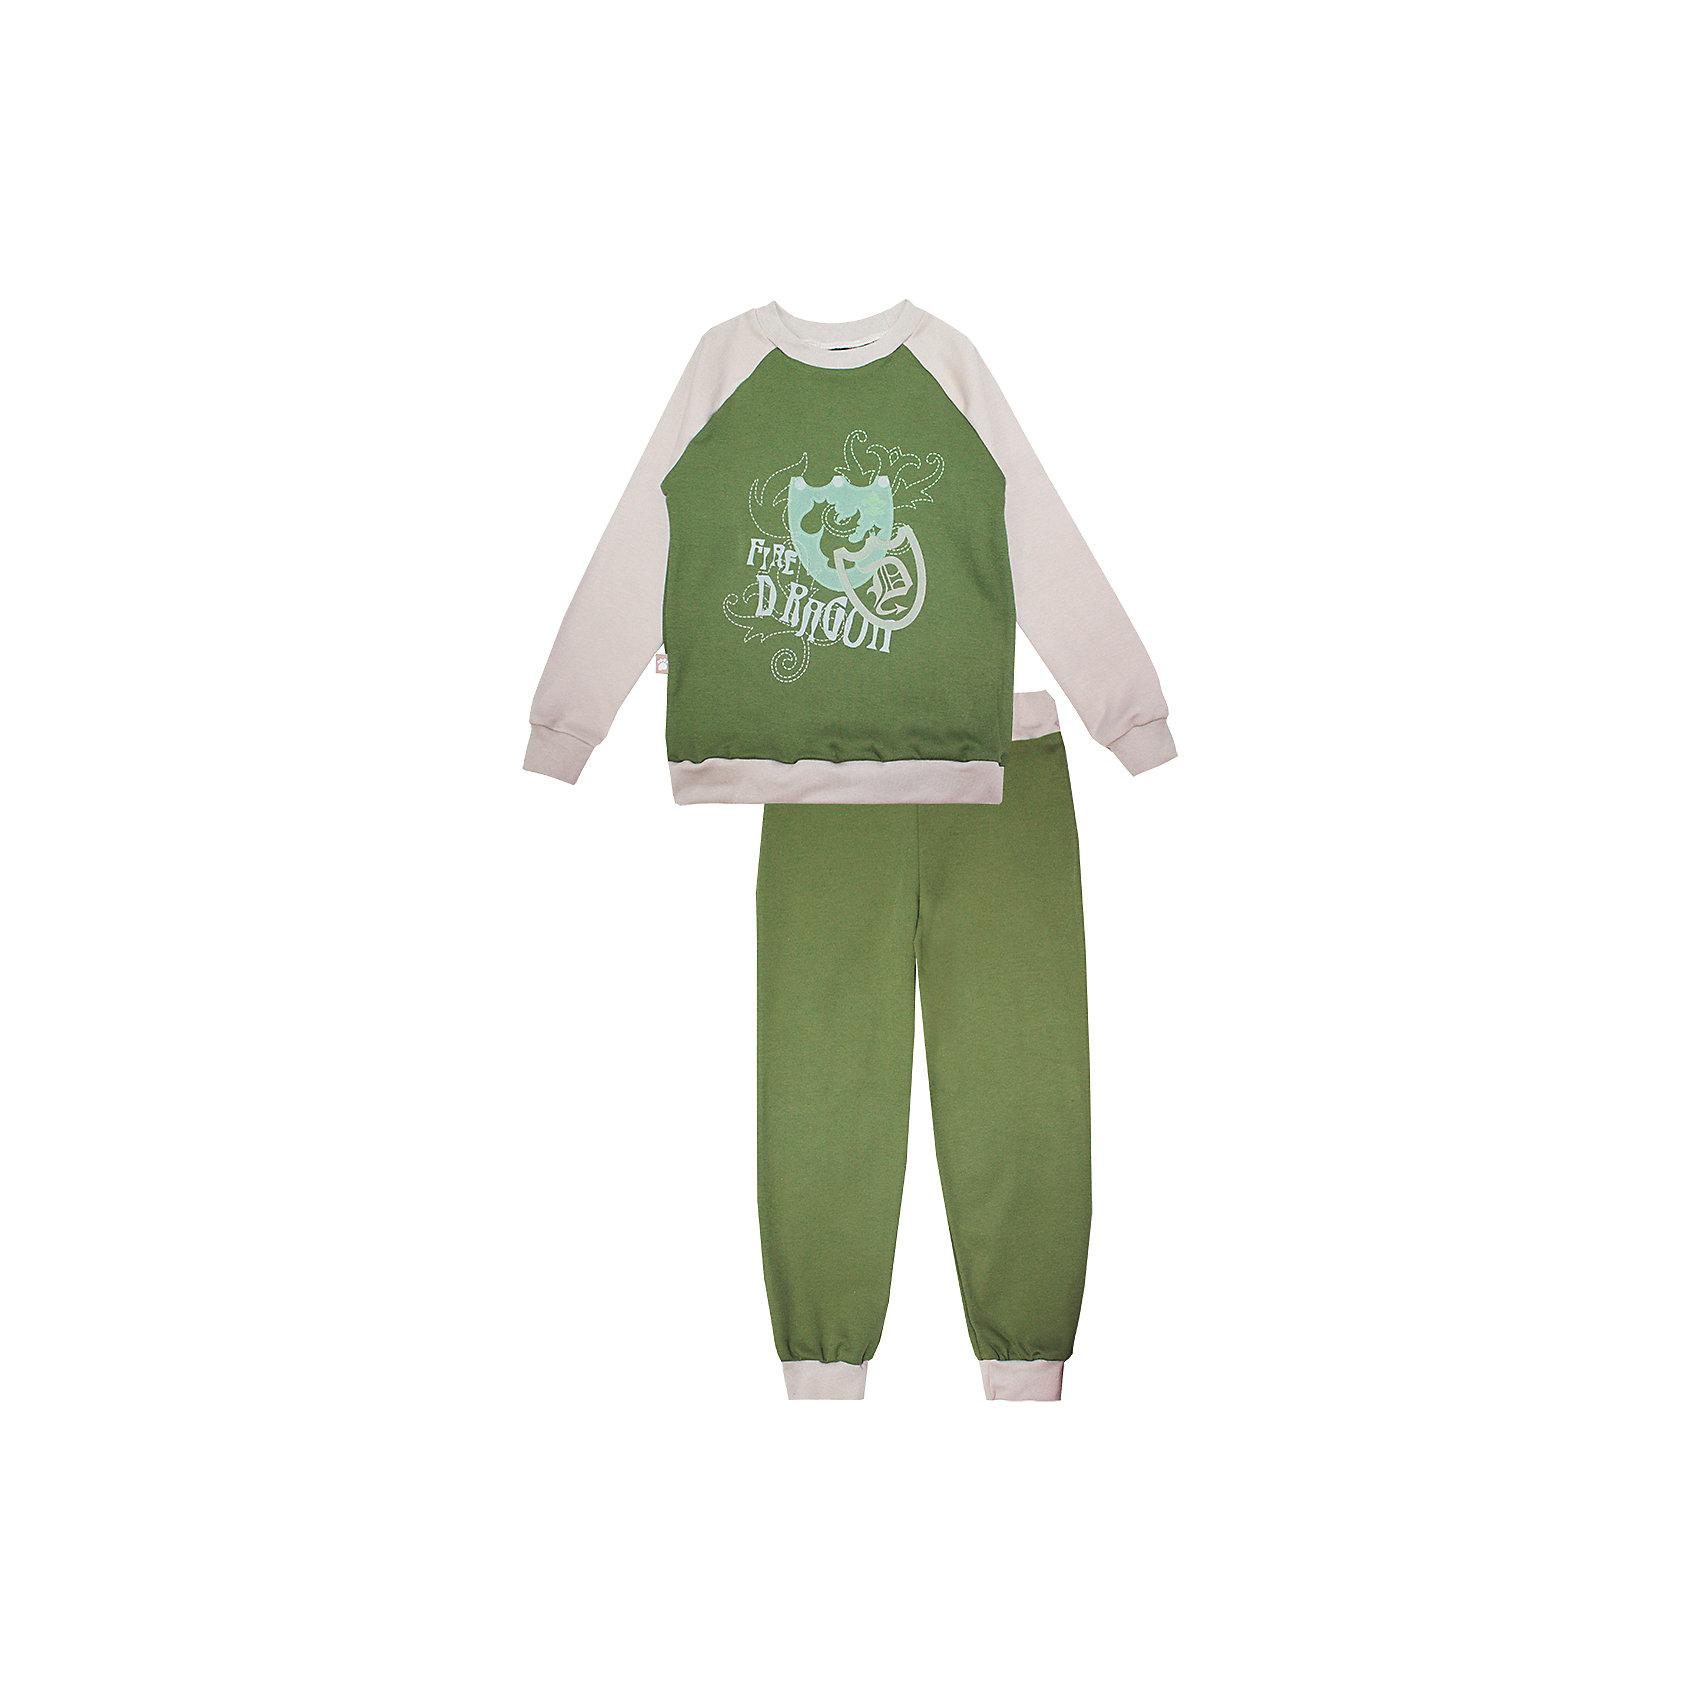 Пижама: футболка с длинным рукавом и штаны для мальчика КотМарКотПижама: футболка с длинным рукавом и штаны для мальчика от известного бренда КотМарКот<br>Состав:<br>100% хлопок<br><br>Ширина мм: 281<br>Глубина мм: 70<br>Высота мм: 188<br>Вес г: 295<br>Цвет: зеленый<br>Возраст от месяцев: 84<br>Возраст до месяцев: 96<br>Пол: Мужской<br>Возраст: Детский<br>Размер: 128,104,116,134,110,122<br>SKU: 4873318